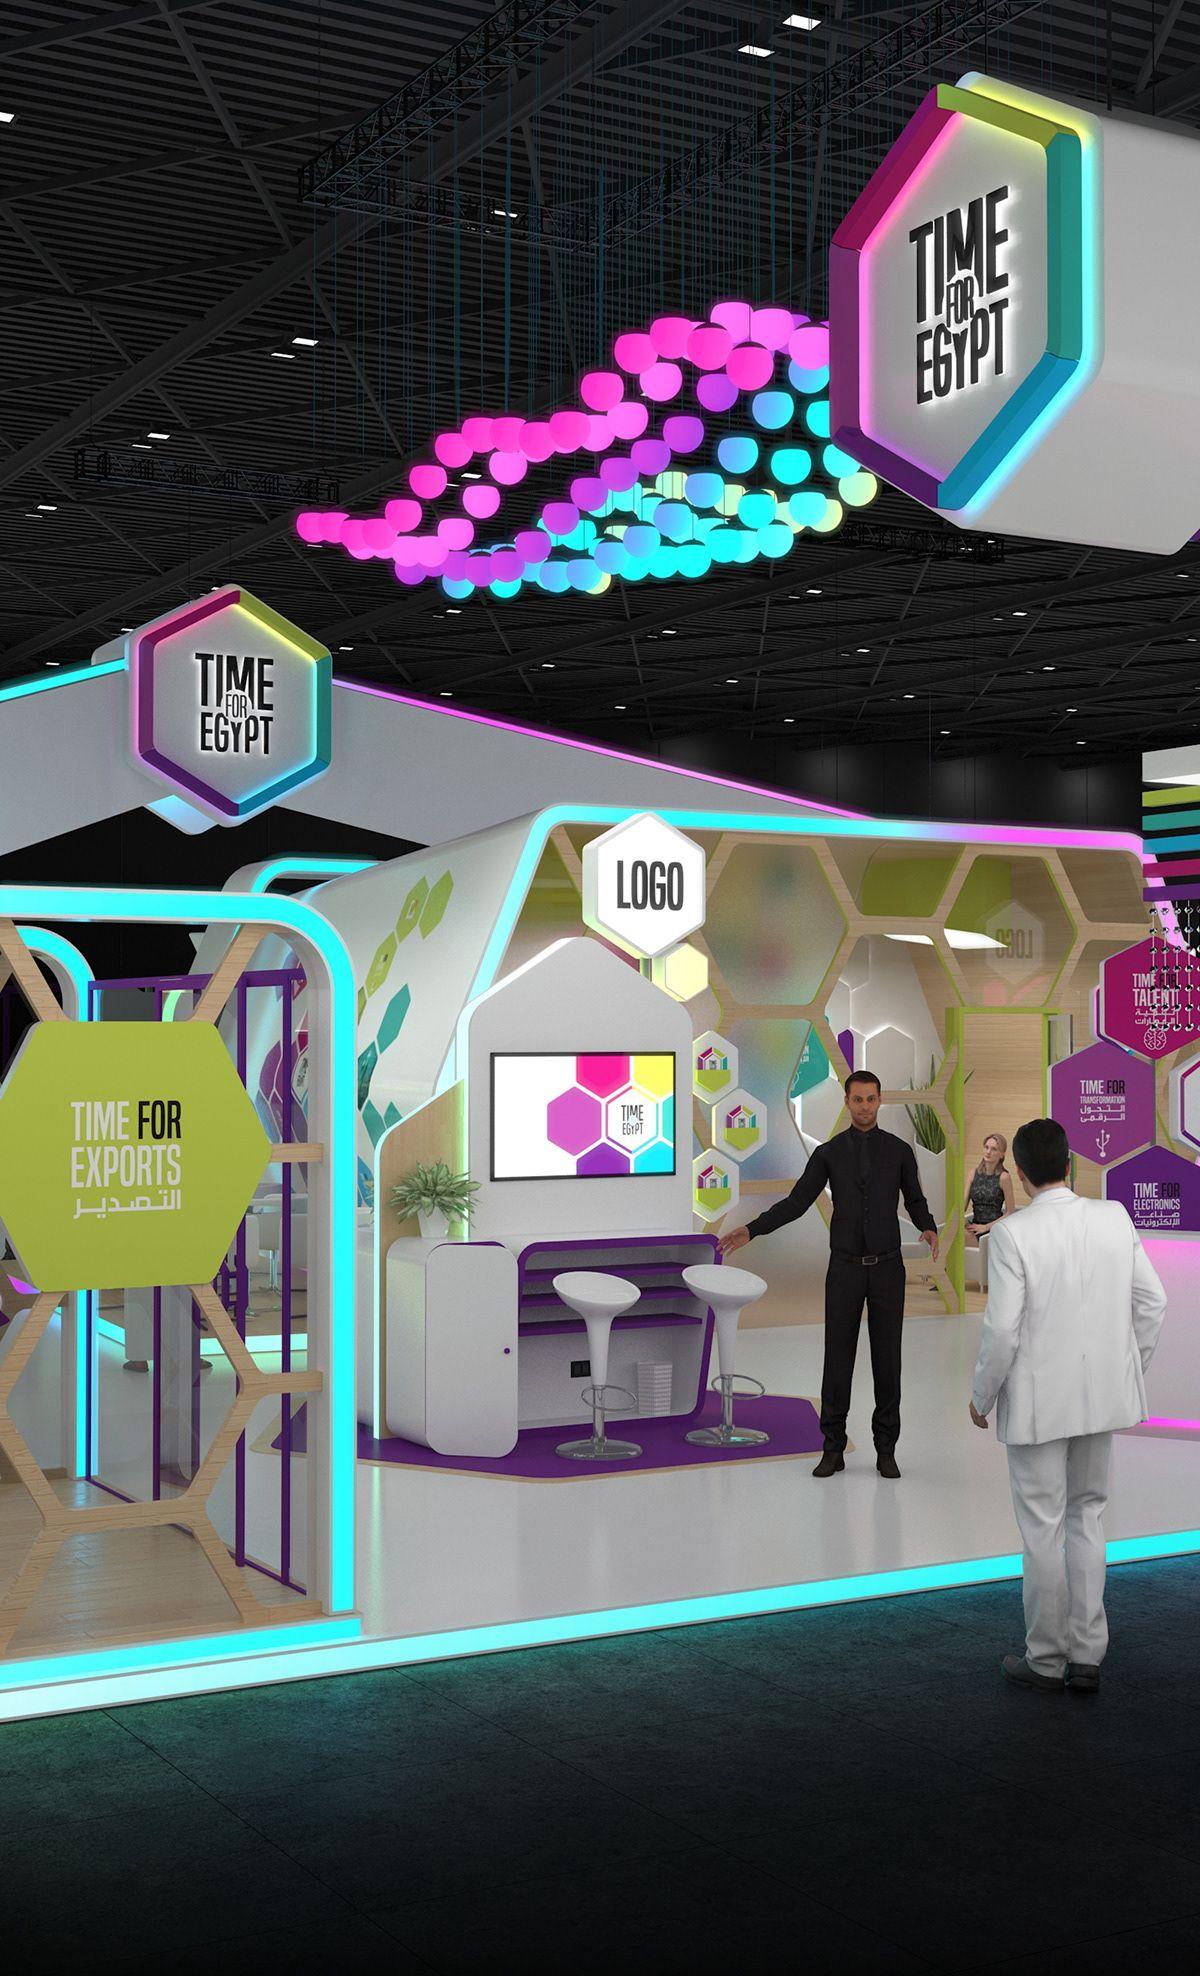 Exhibition Stand Design Egypt : Time for egypt at gitex technology week dubai on behance